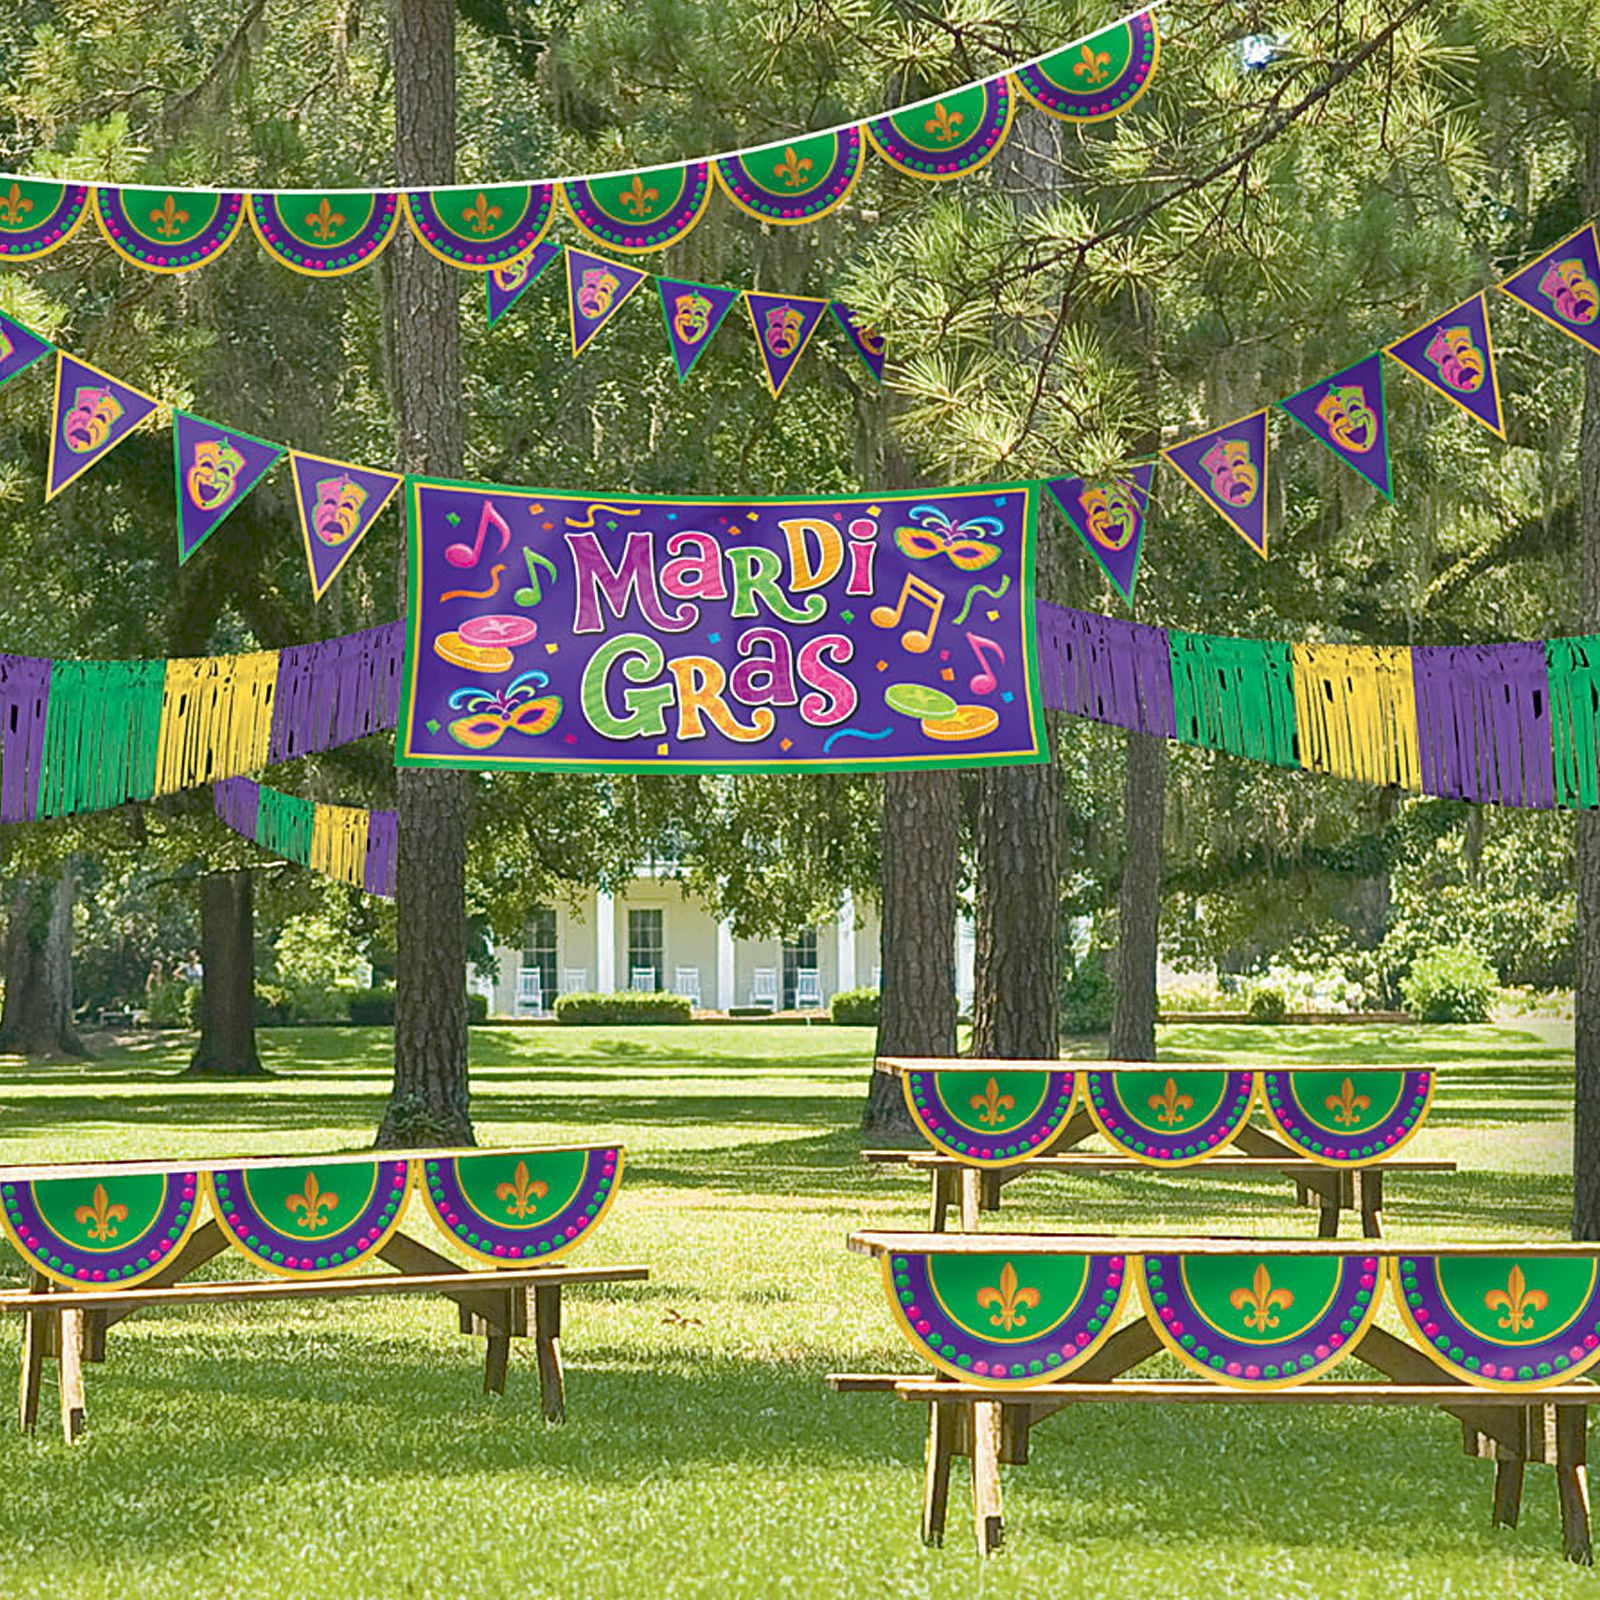 mardi gras decorating ideas outdoor | garden decor | pinterest